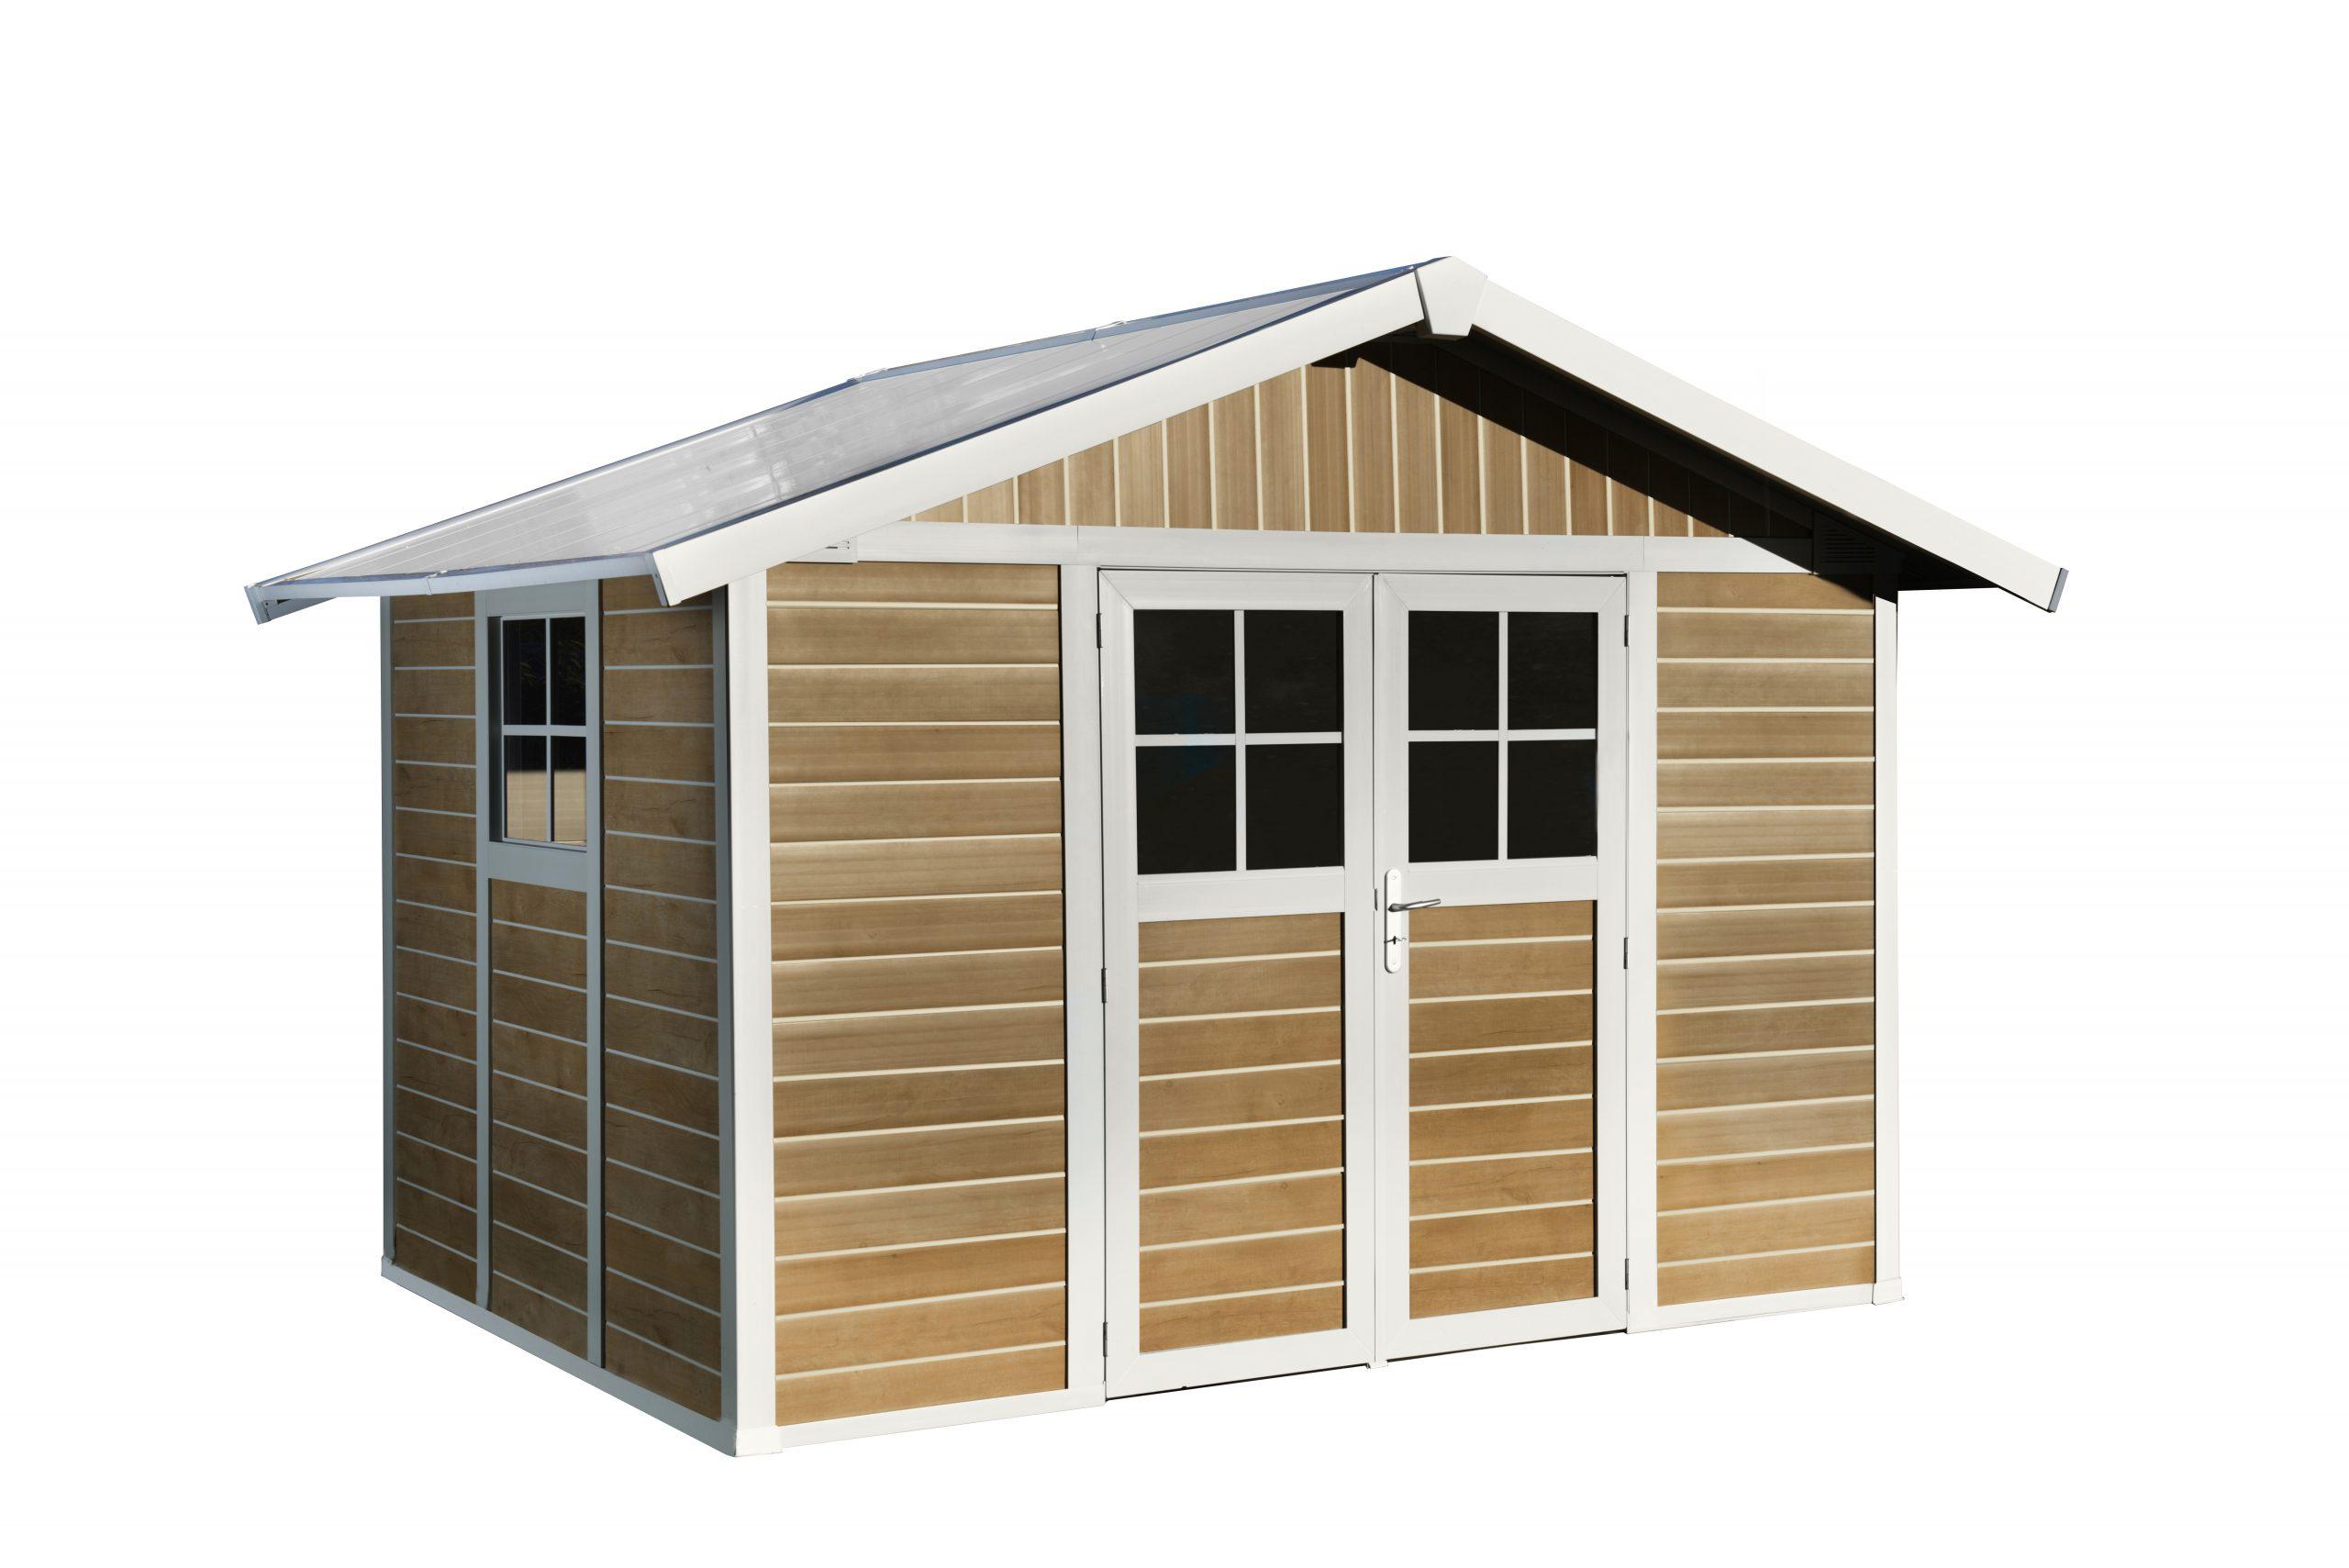 7.5 M² 'sherwood Deco' Garden Sheds | Grosfillex encequiconcerne Grosfillex Abri De Jardin Pvc